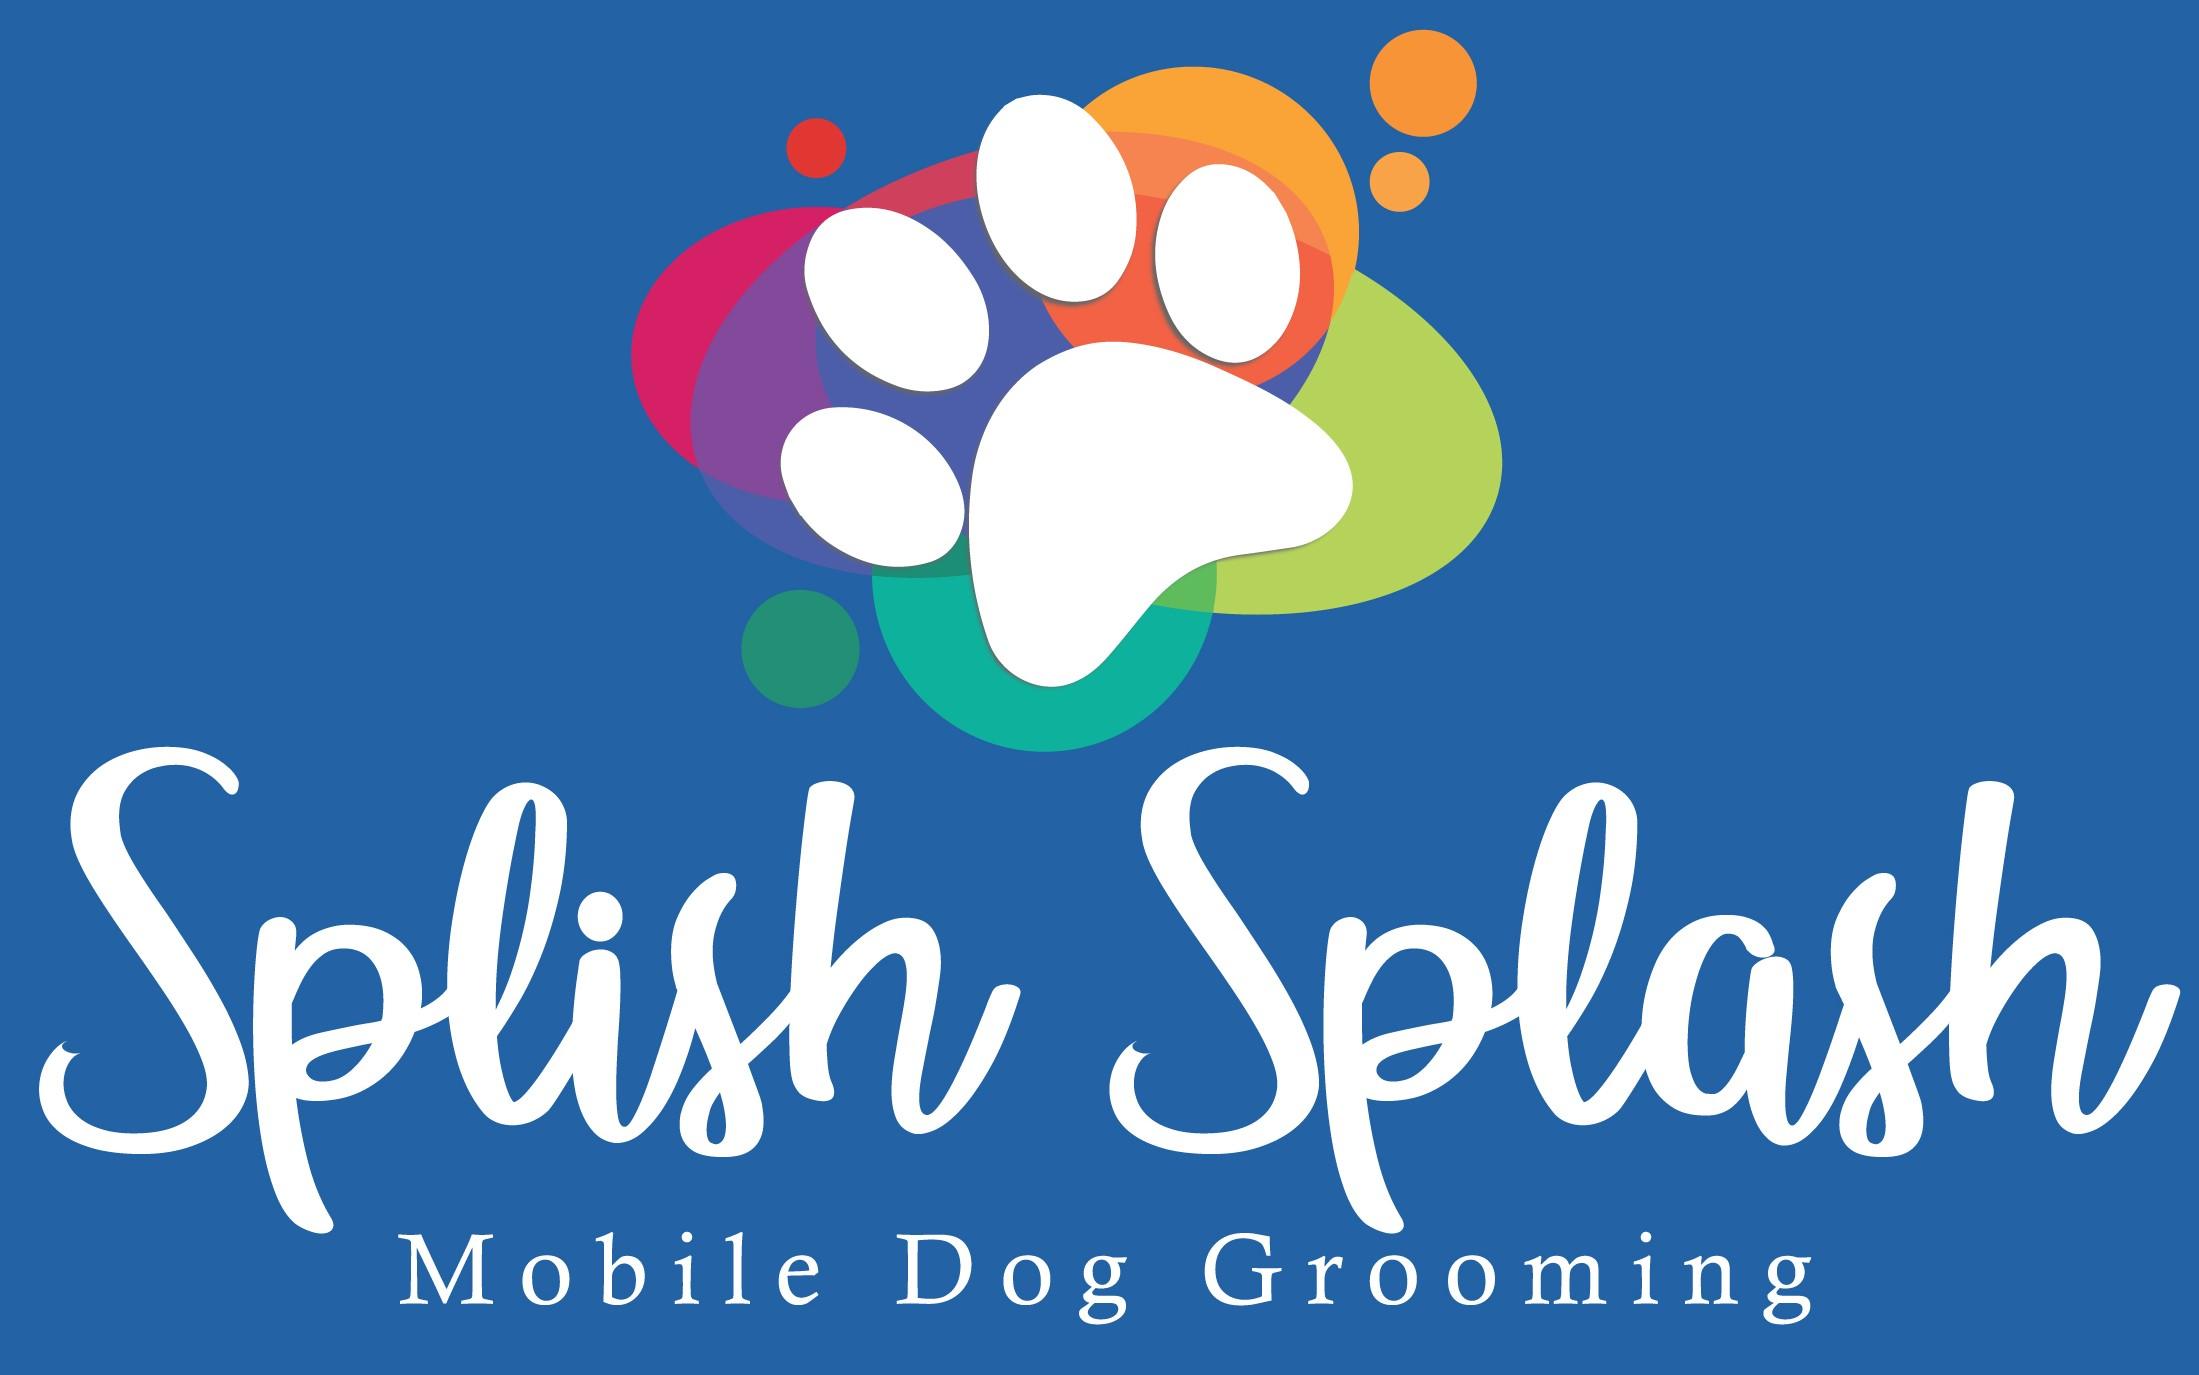 splish splash _final_crop-_white with bg-01